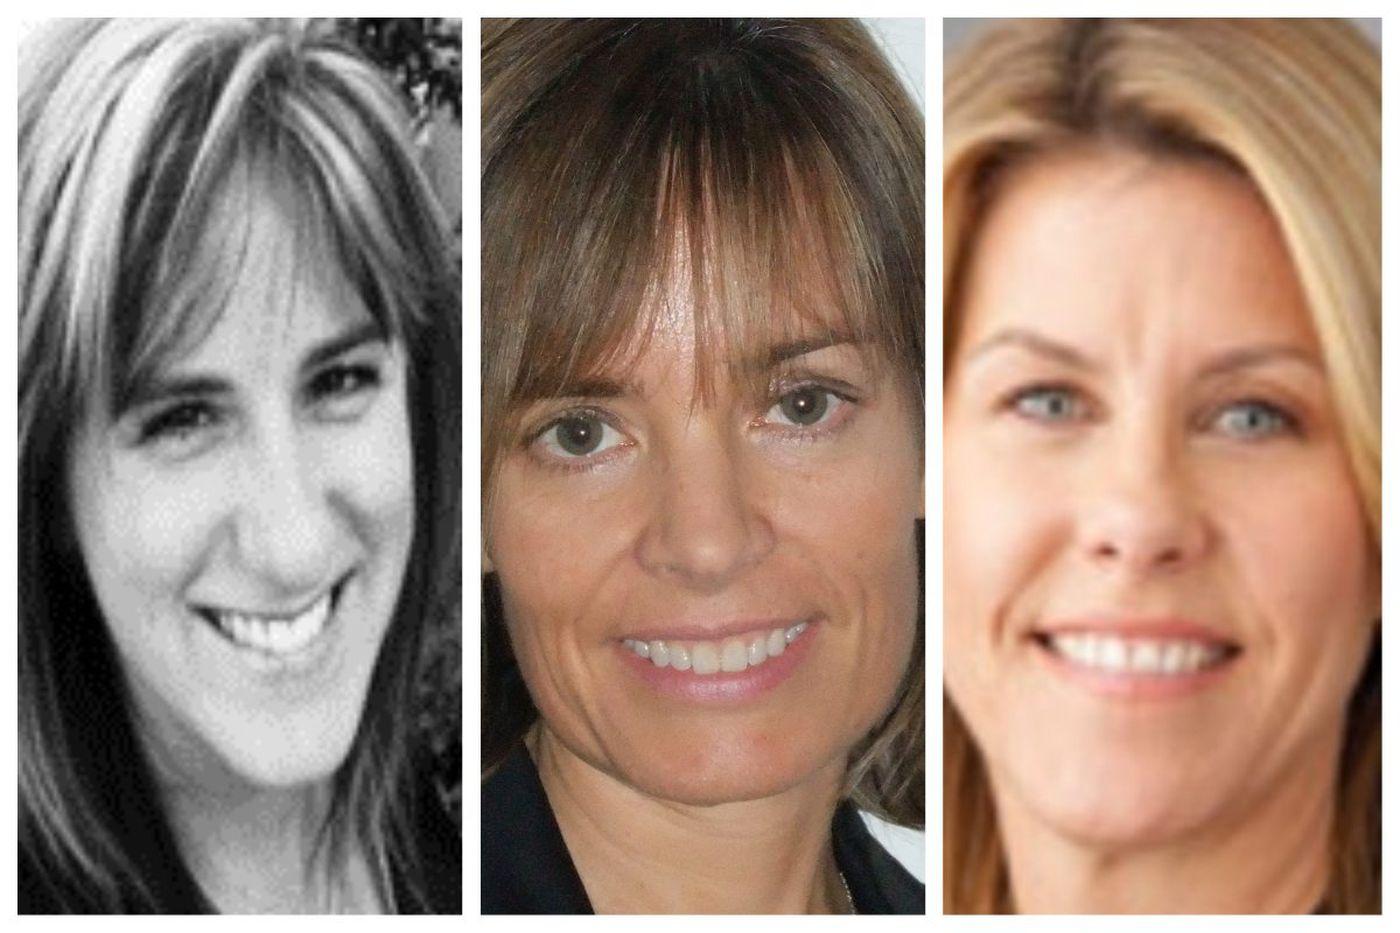 Investors propose three women as board members at Destination Maternity